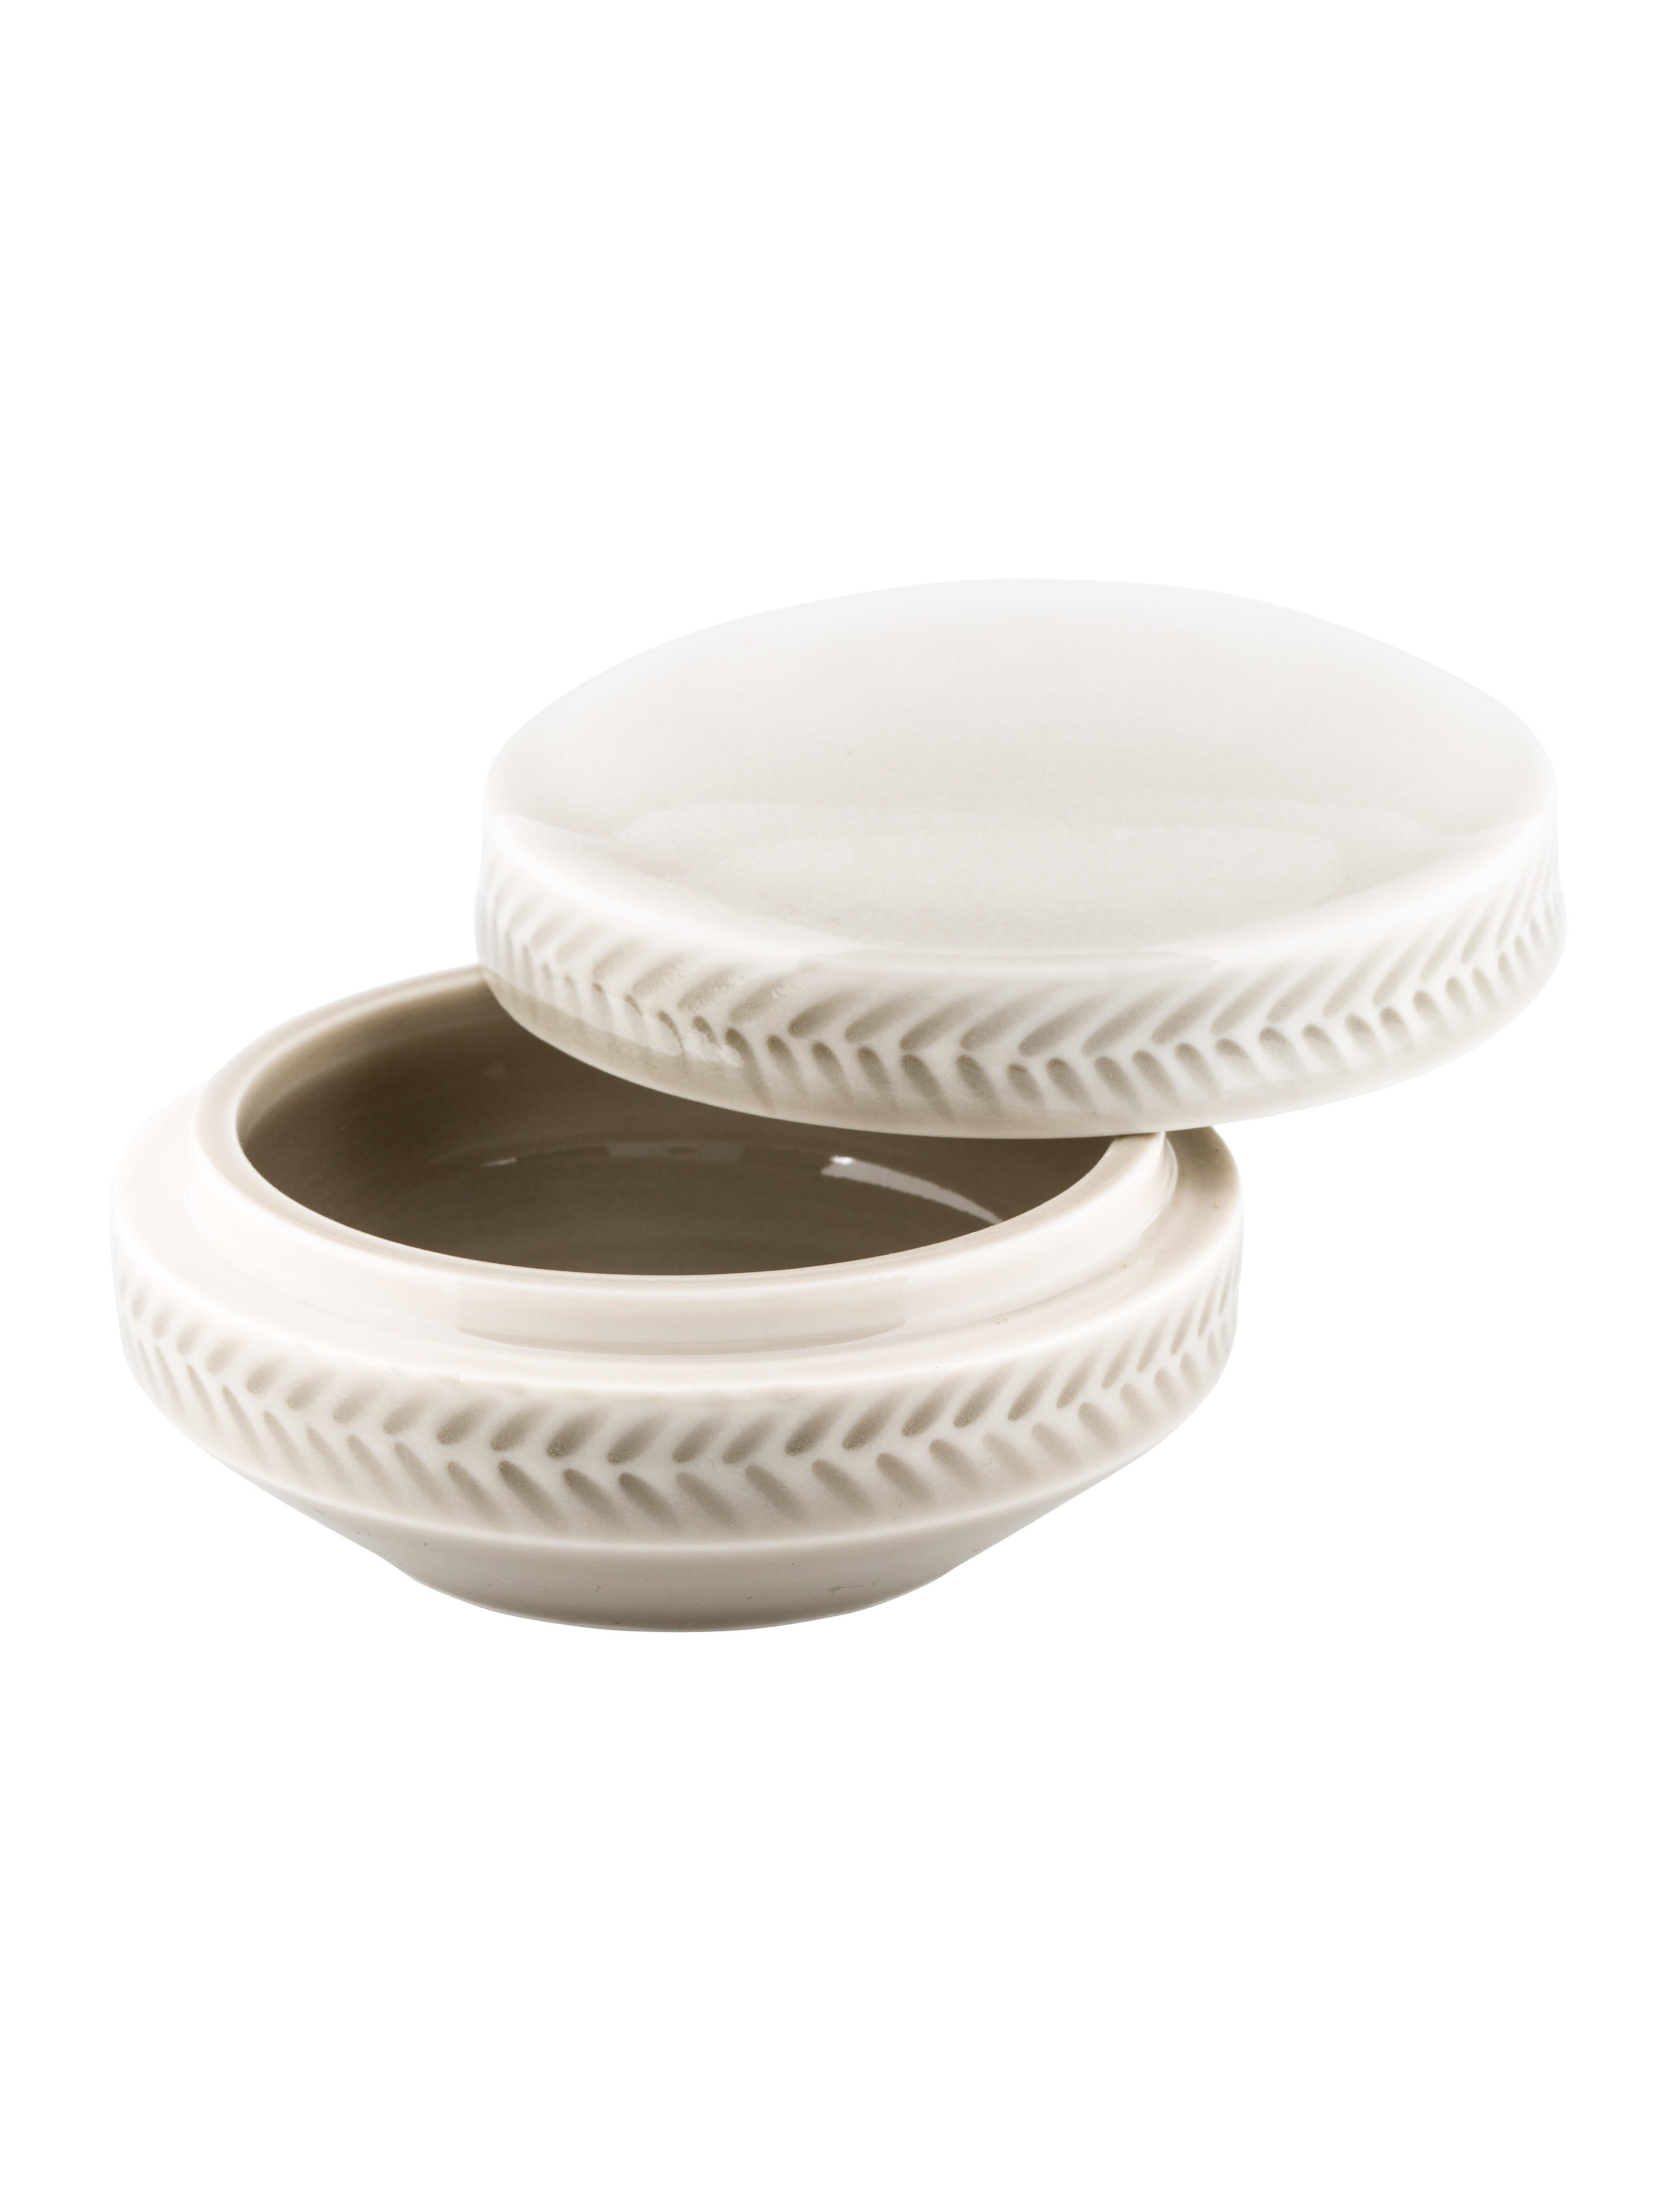 hardy ceramic jewelry box decor and accessories